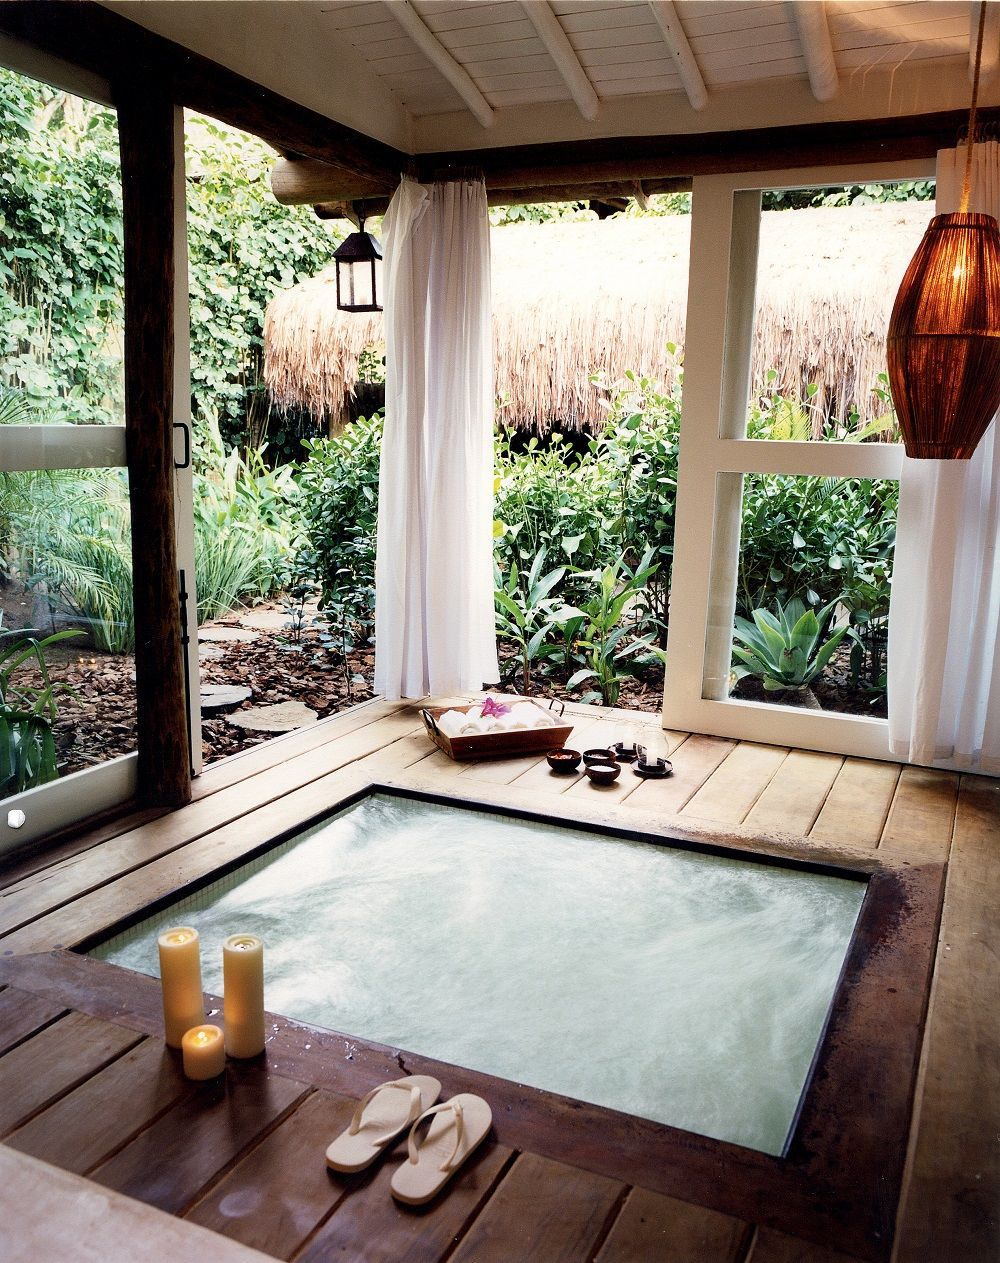 Uxua Casa Hotel Home My Dream Home Indoor Hot Tub Modern outdoor hot tub